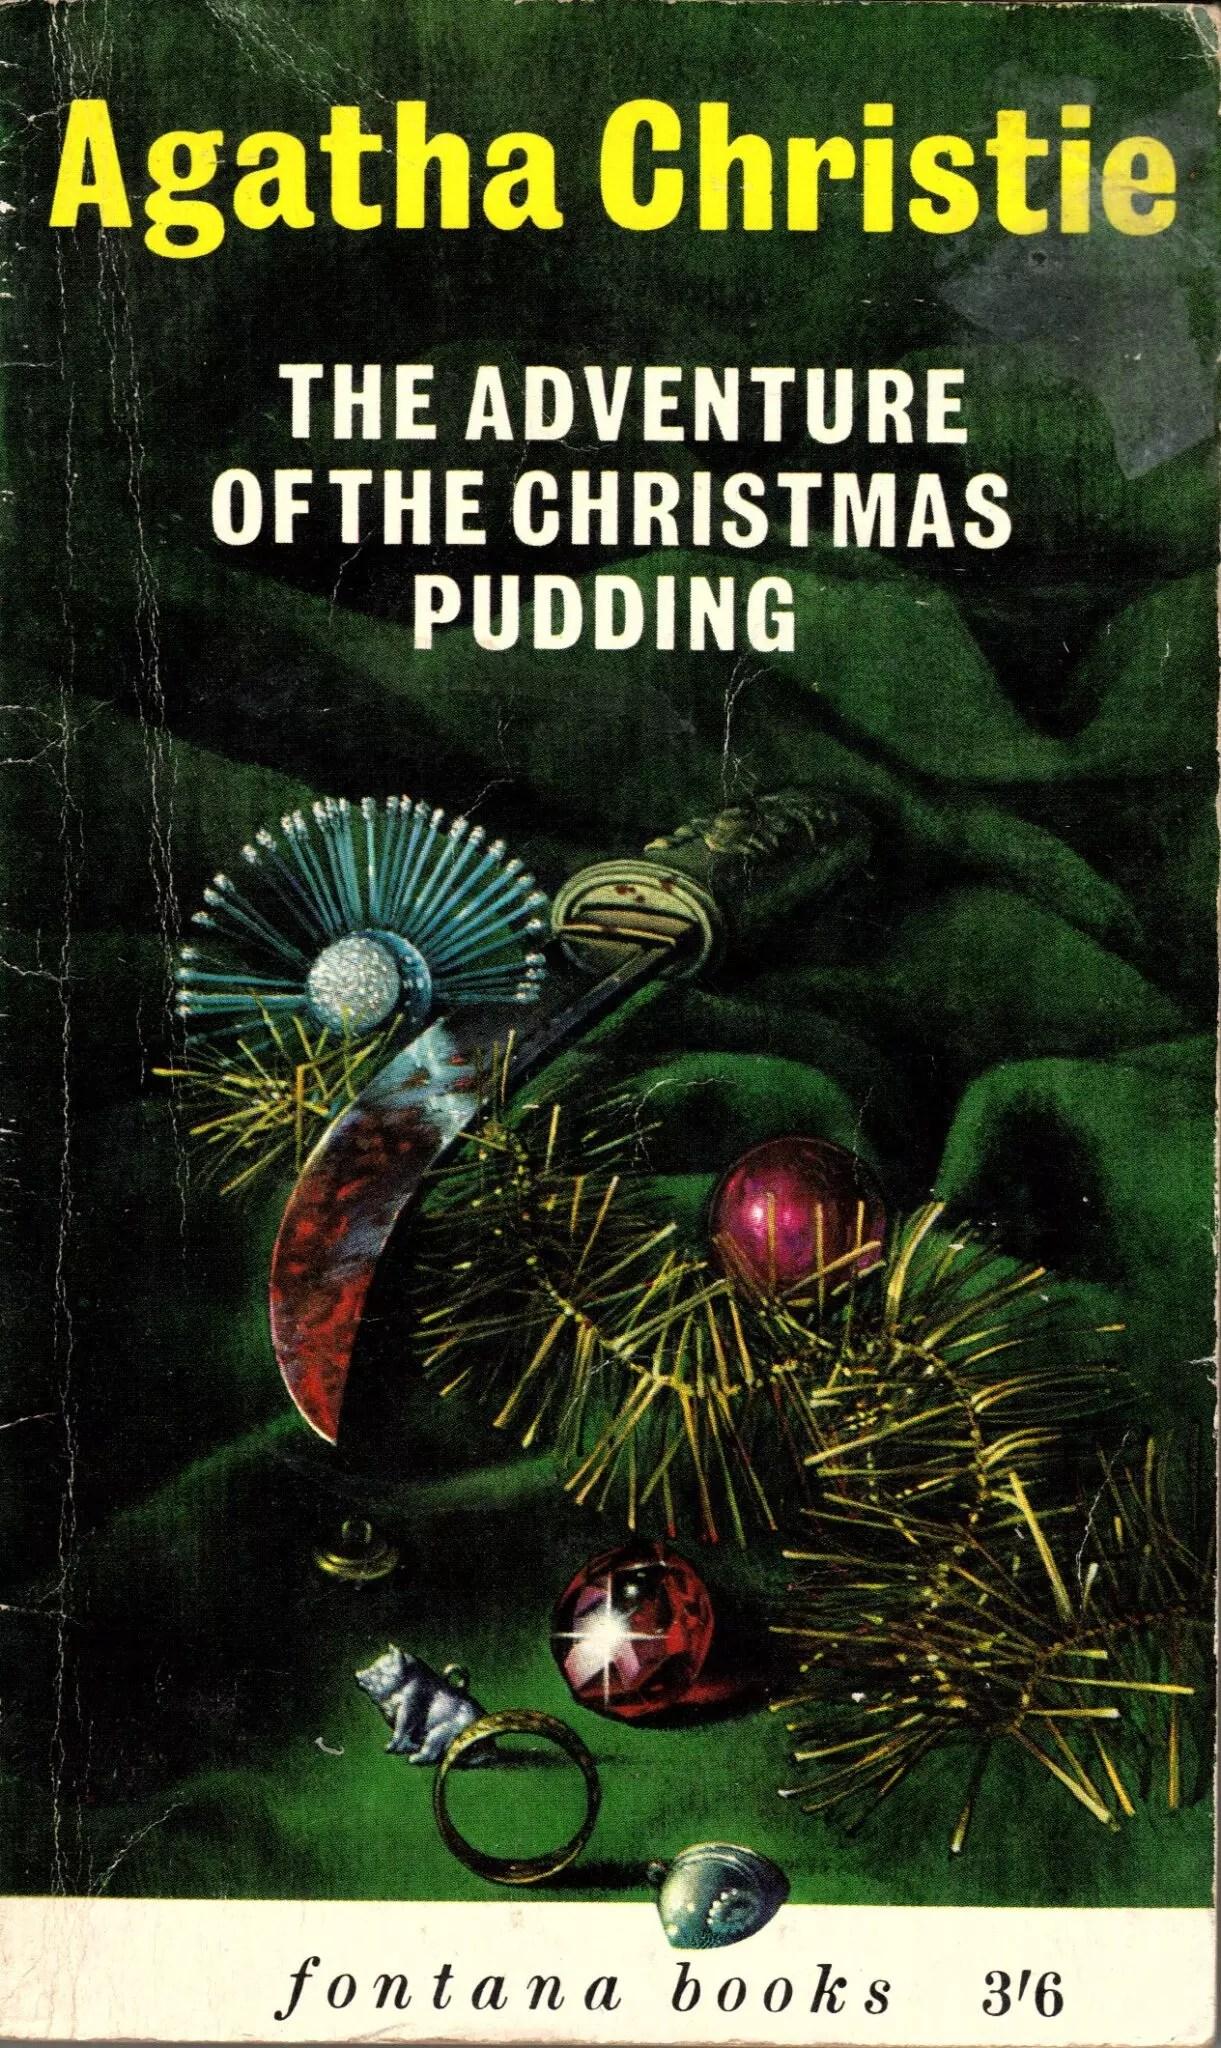 Agatha Christie Tom Adams The Adventures of the Christmas Pudding 2 Fontana